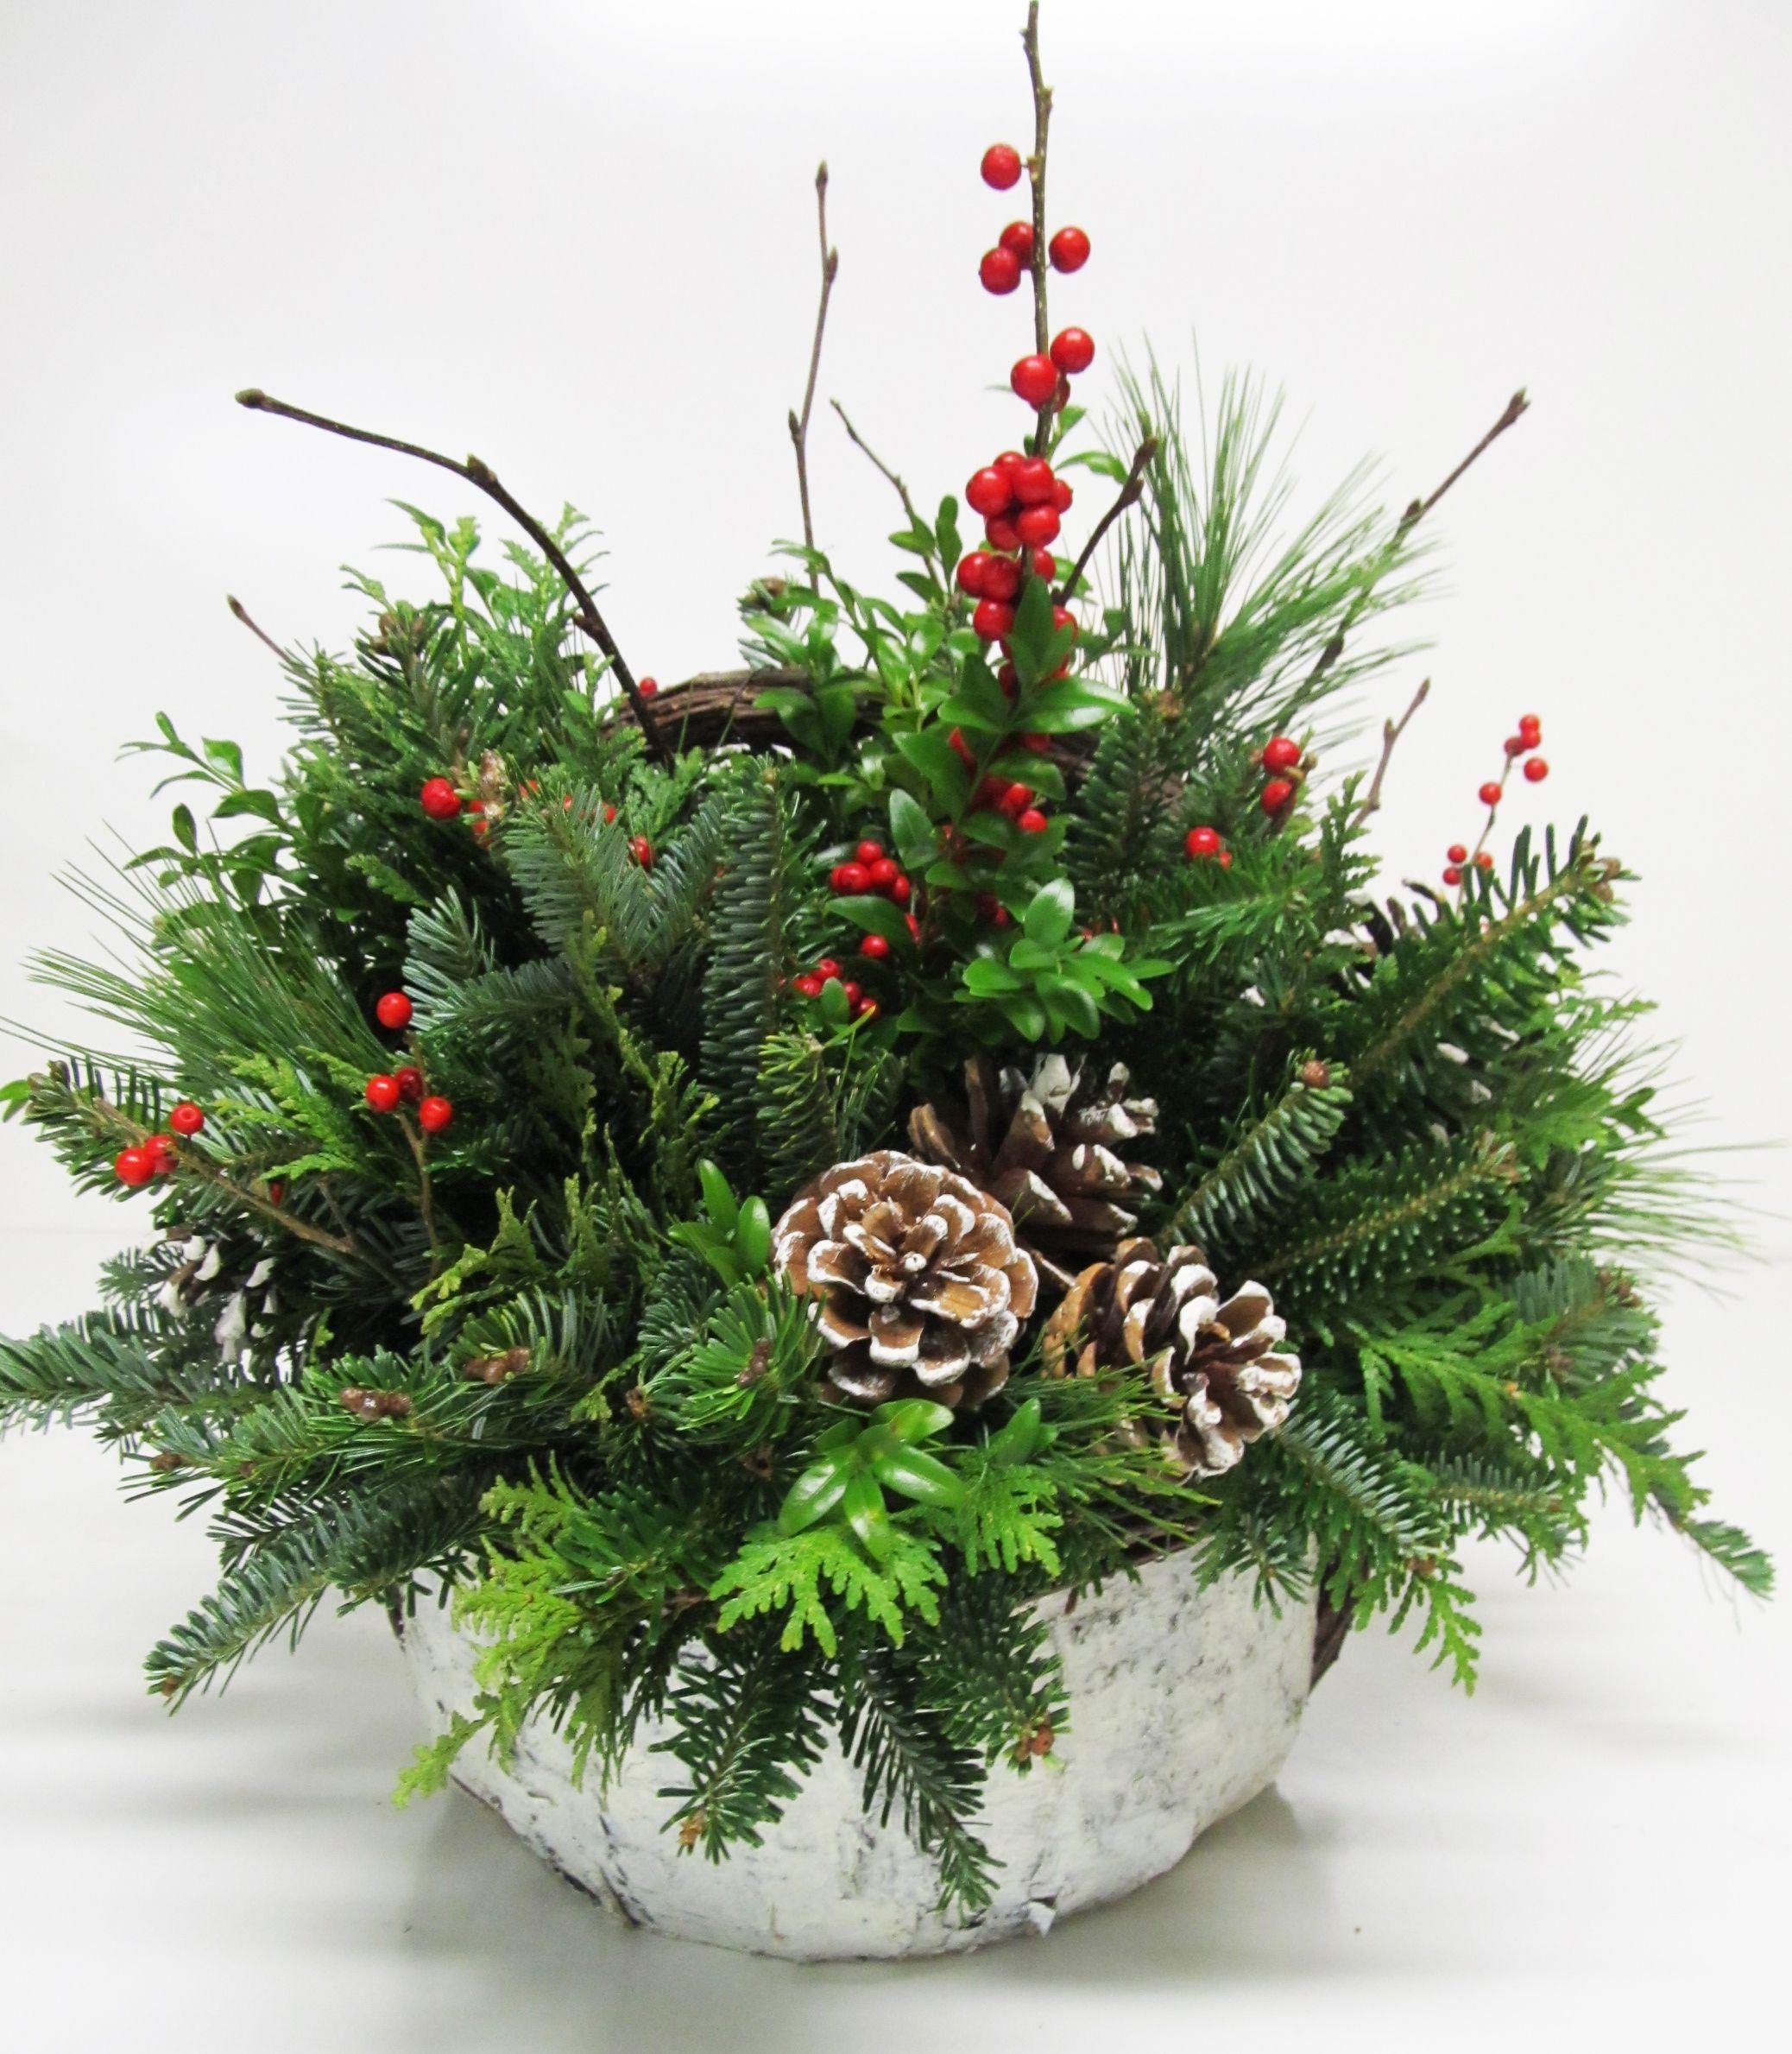 greenery arrangement weihnachten pinterest gestecke. Black Bedroom Furniture Sets. Home Design Ideas